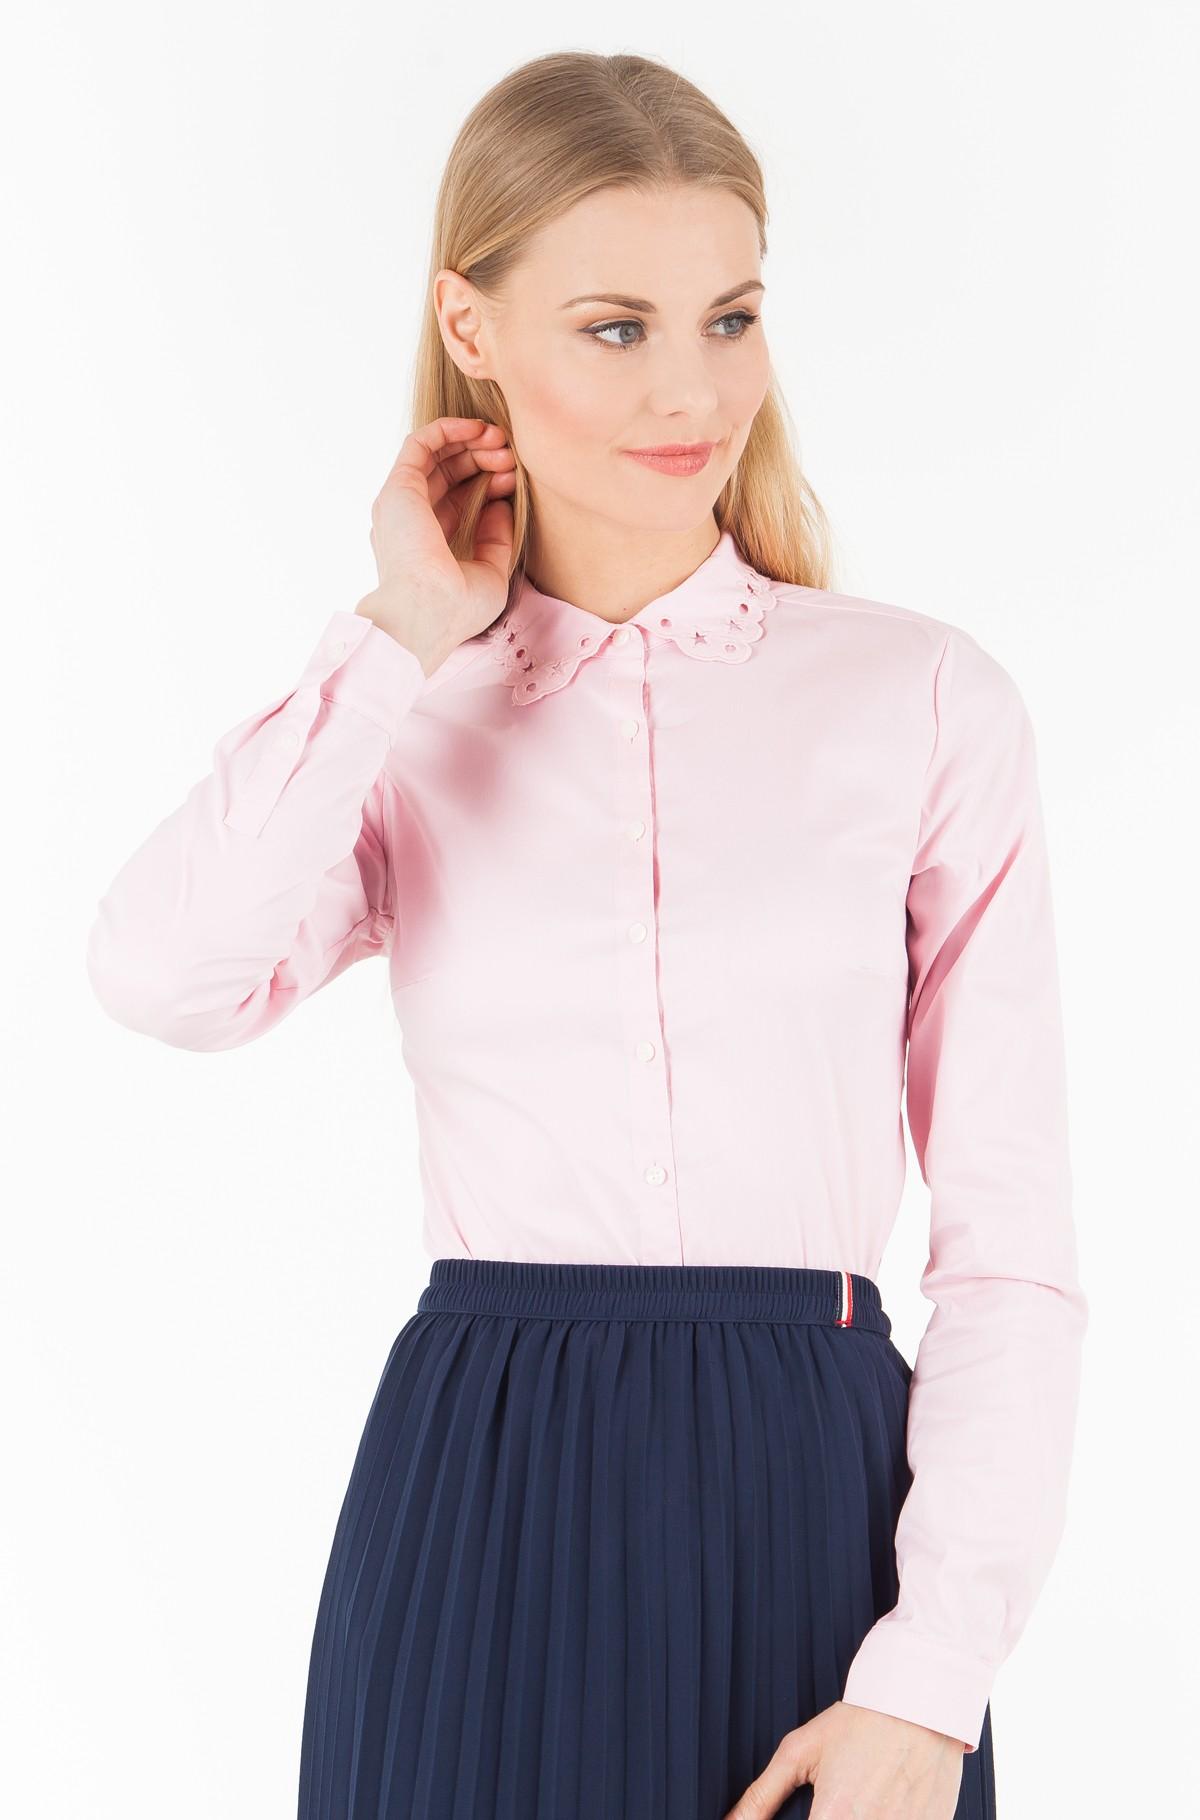 Marškiniai Hallina Shirt Ls W1-full-1